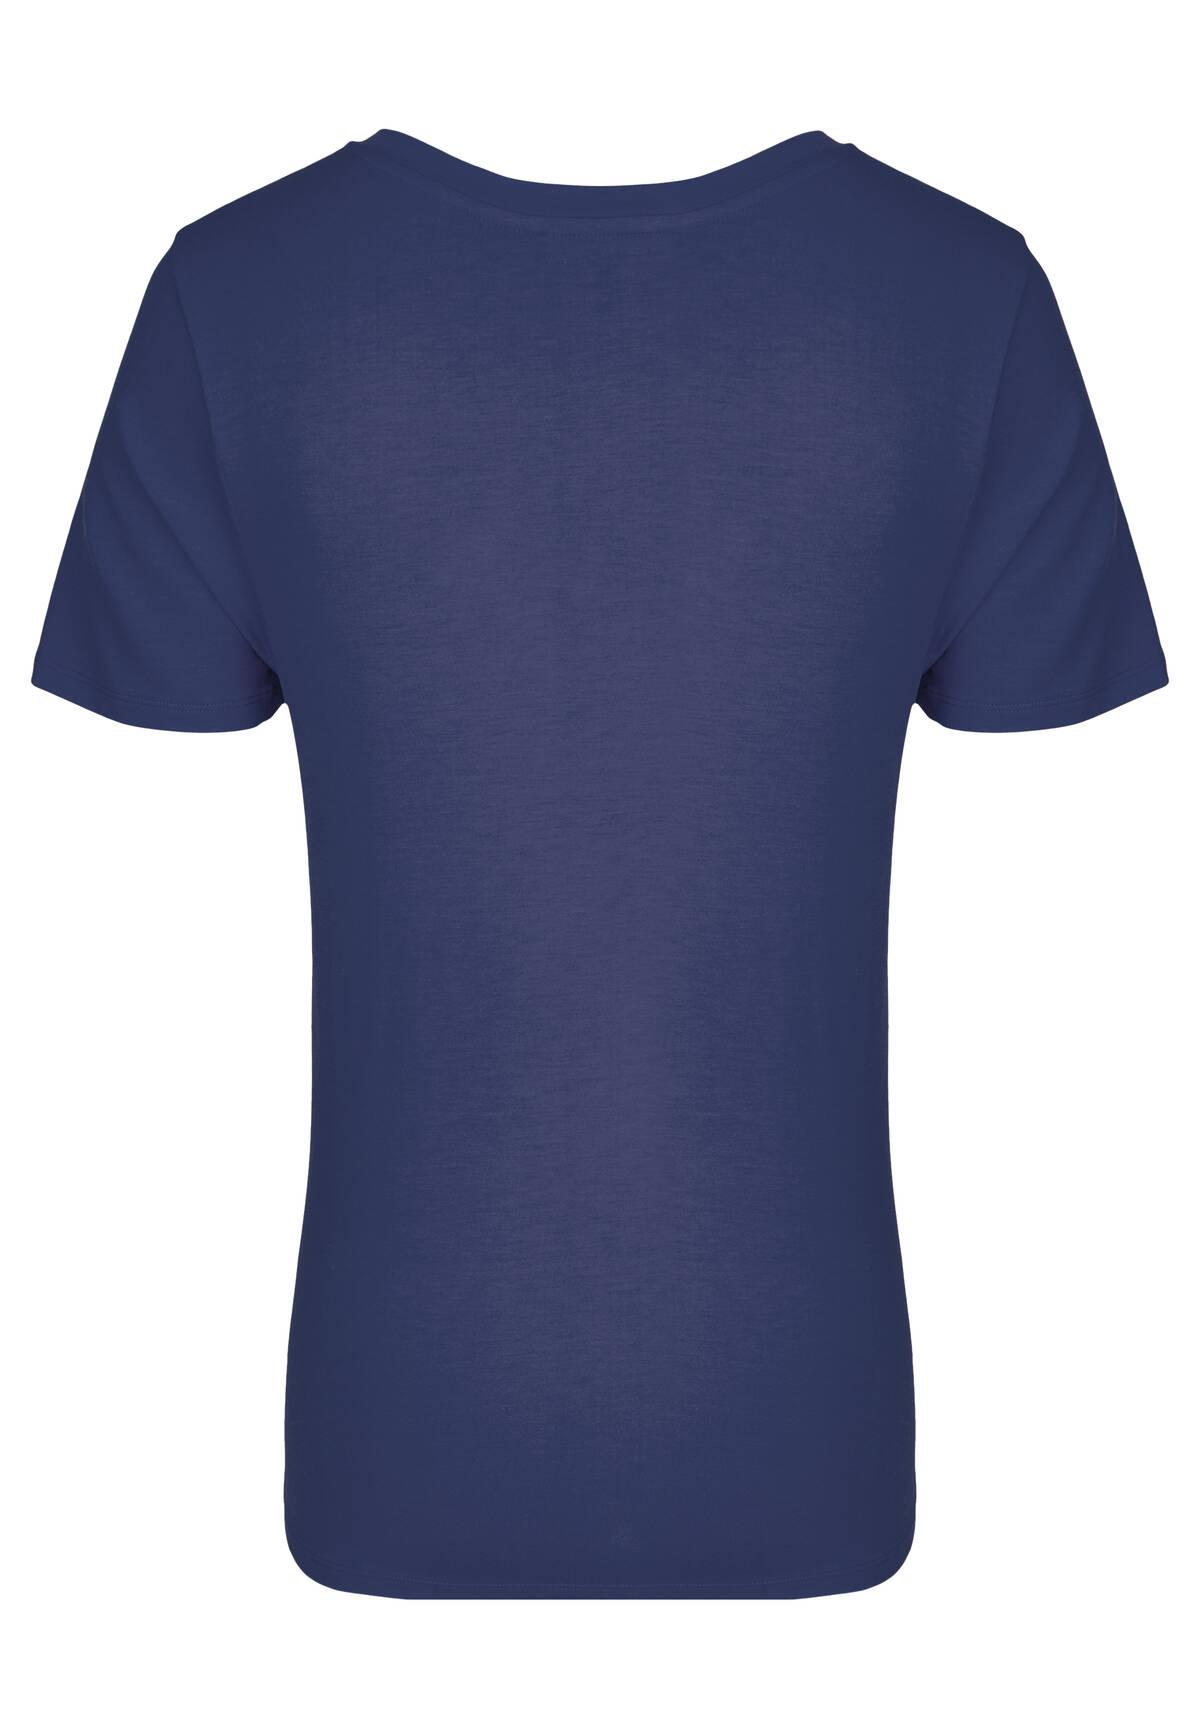 Sportives Shirt aus Viskose / V-Neck Shirt